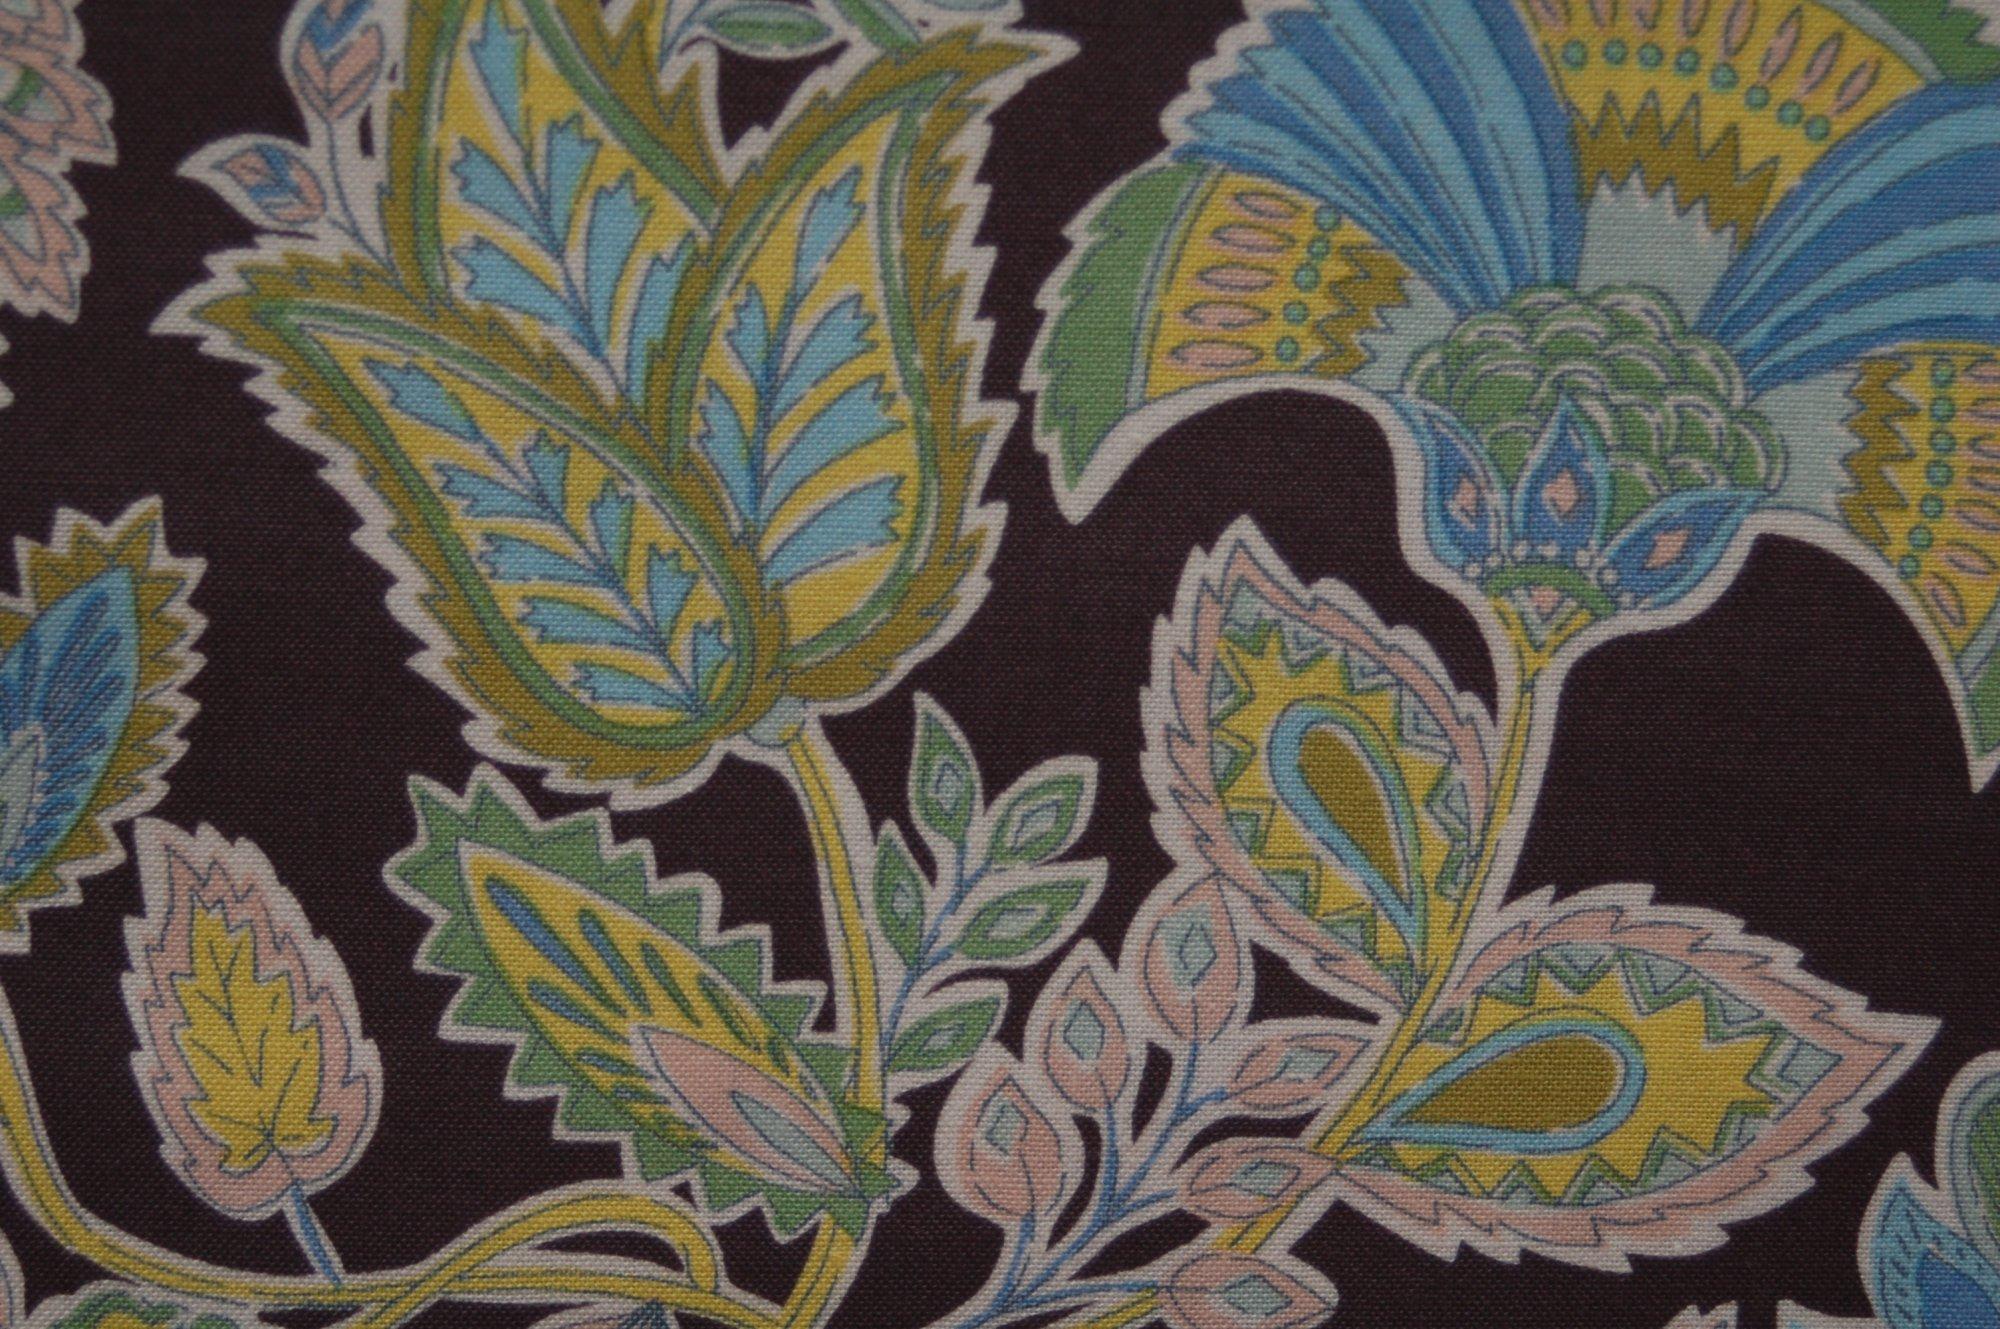 Dream Catcher - Chintz from Josephine Kimberling for Blend Fabrics